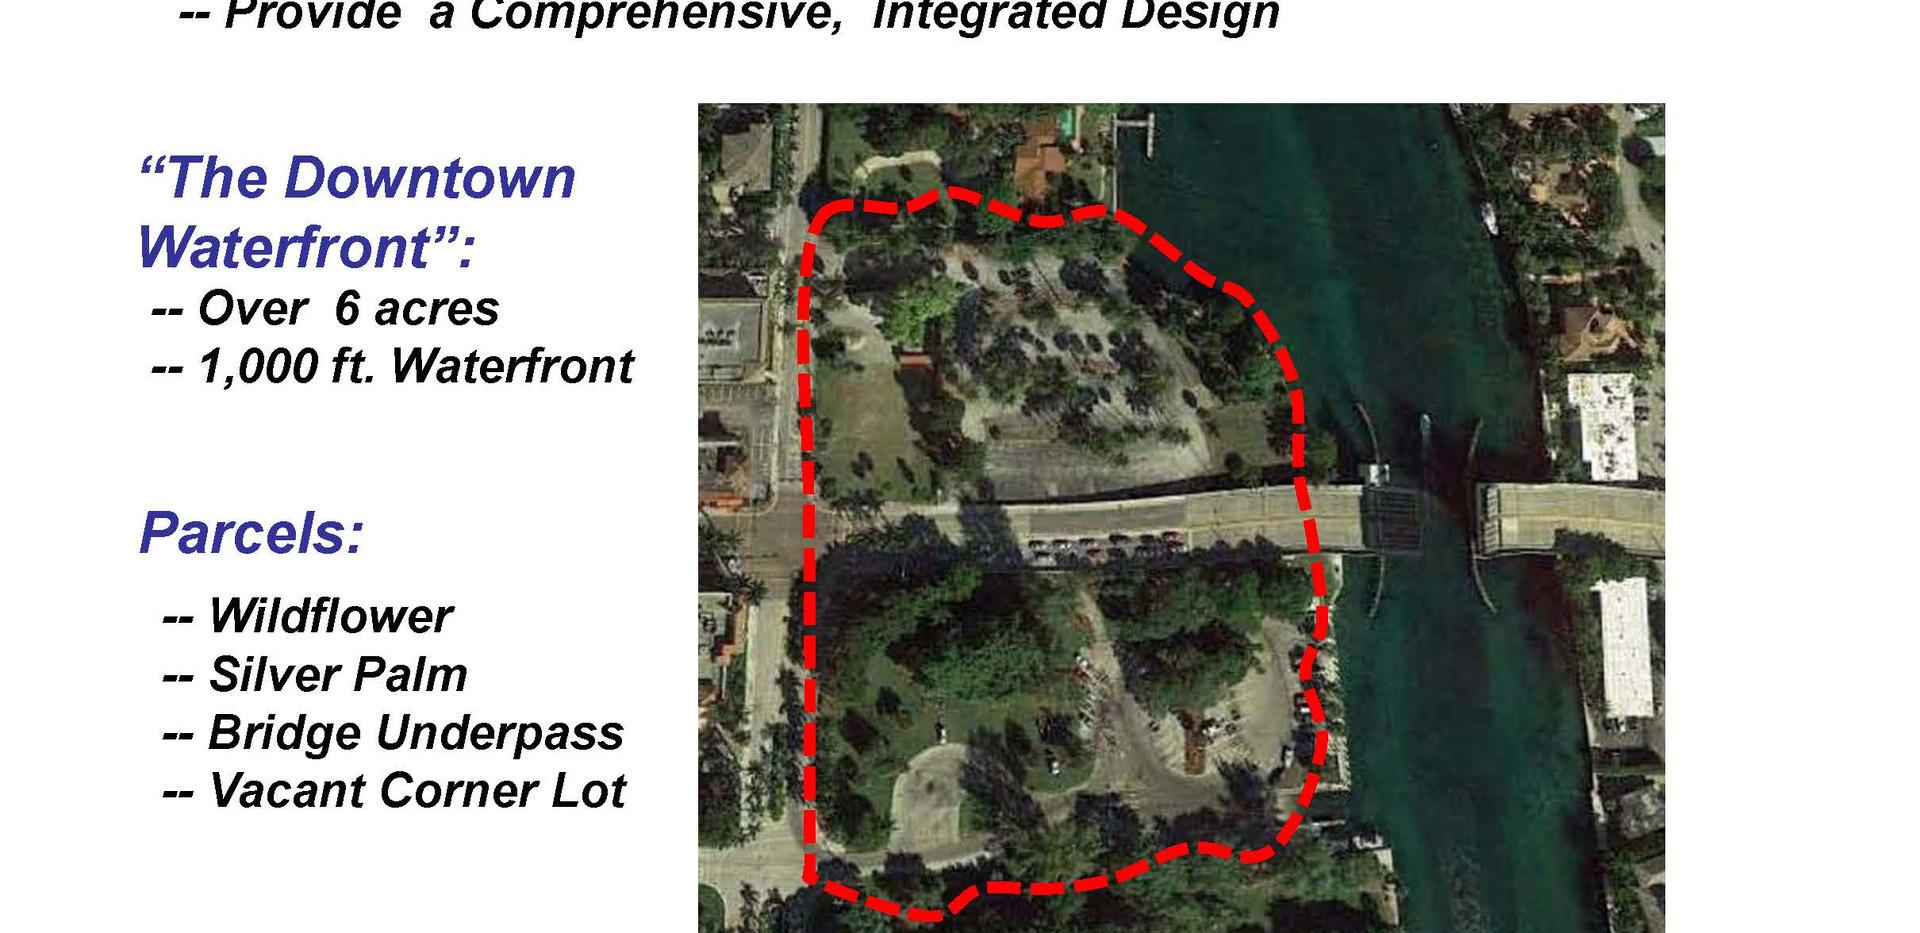 2_Boca Raton Downtown Waterfront_Parcels